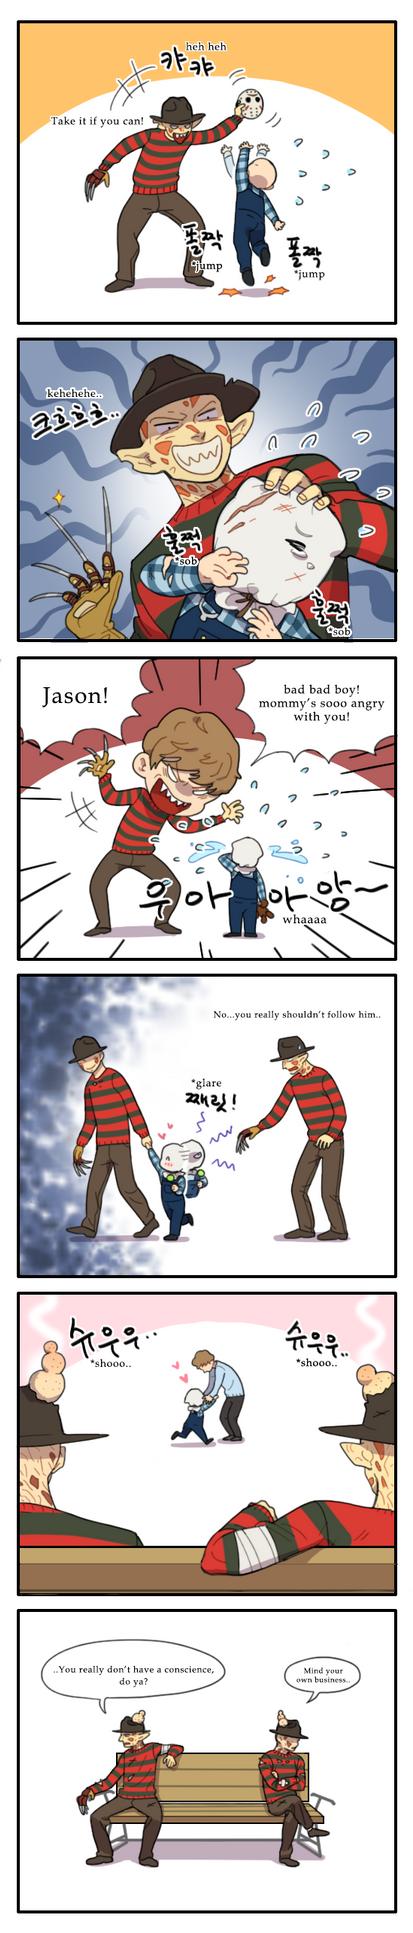 Original Freddy and little Jason by NRjin